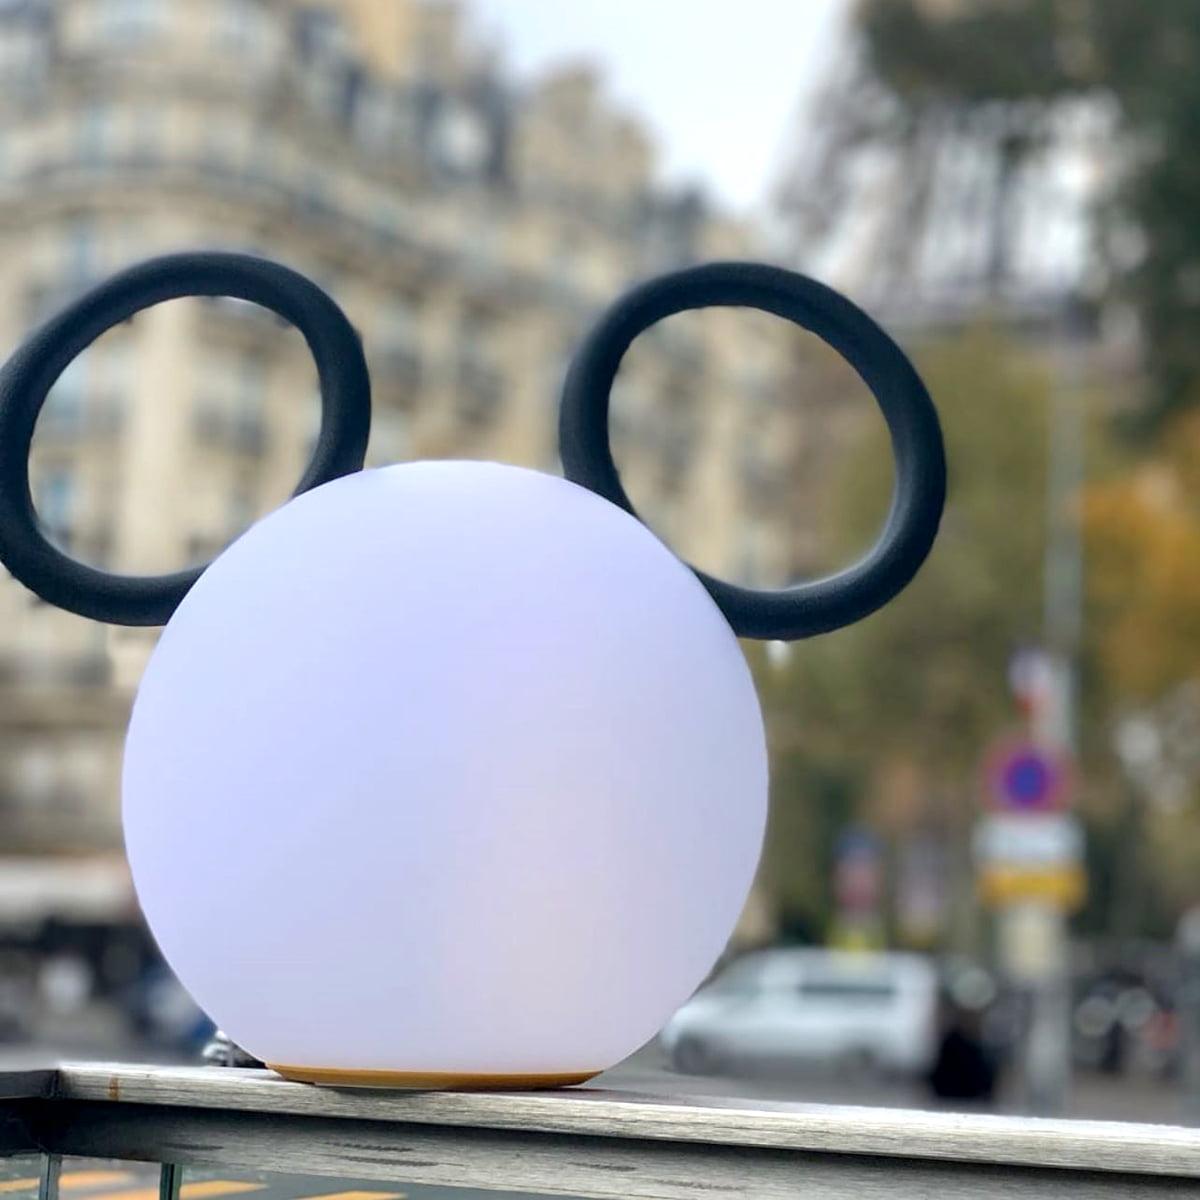 Mickey Mouse Akku LED-Leuchte von Fermob | Connox